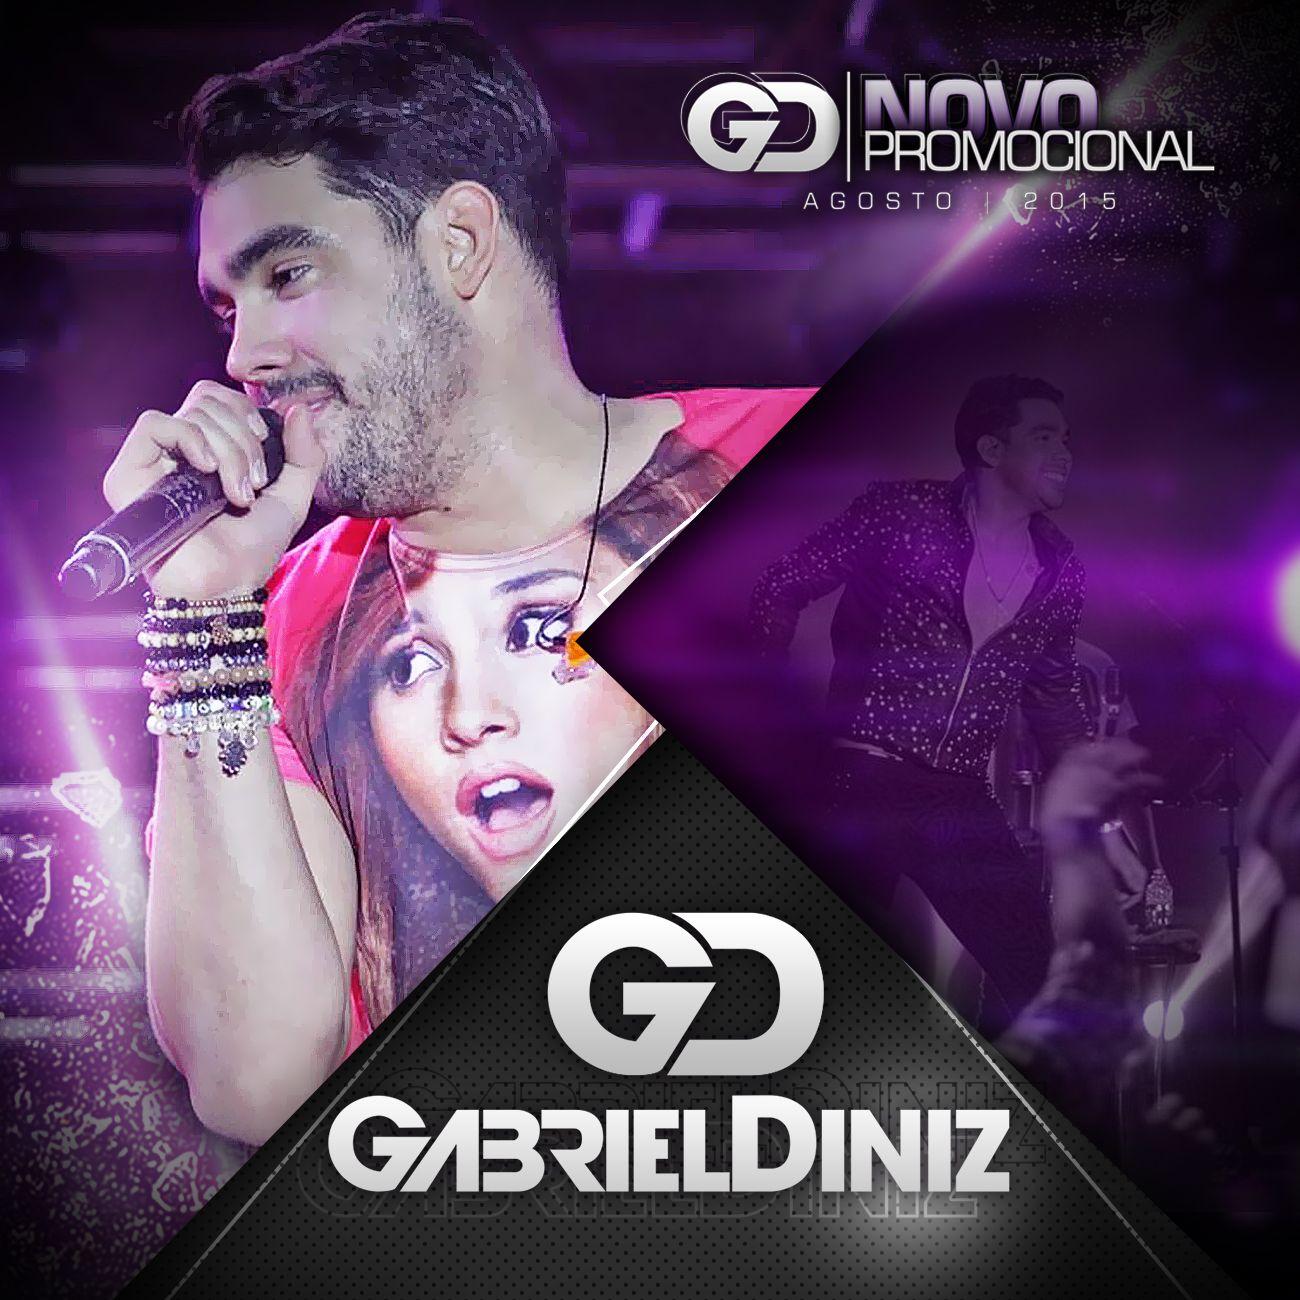 Gabriel Diniz sempre lançou discos promocionais